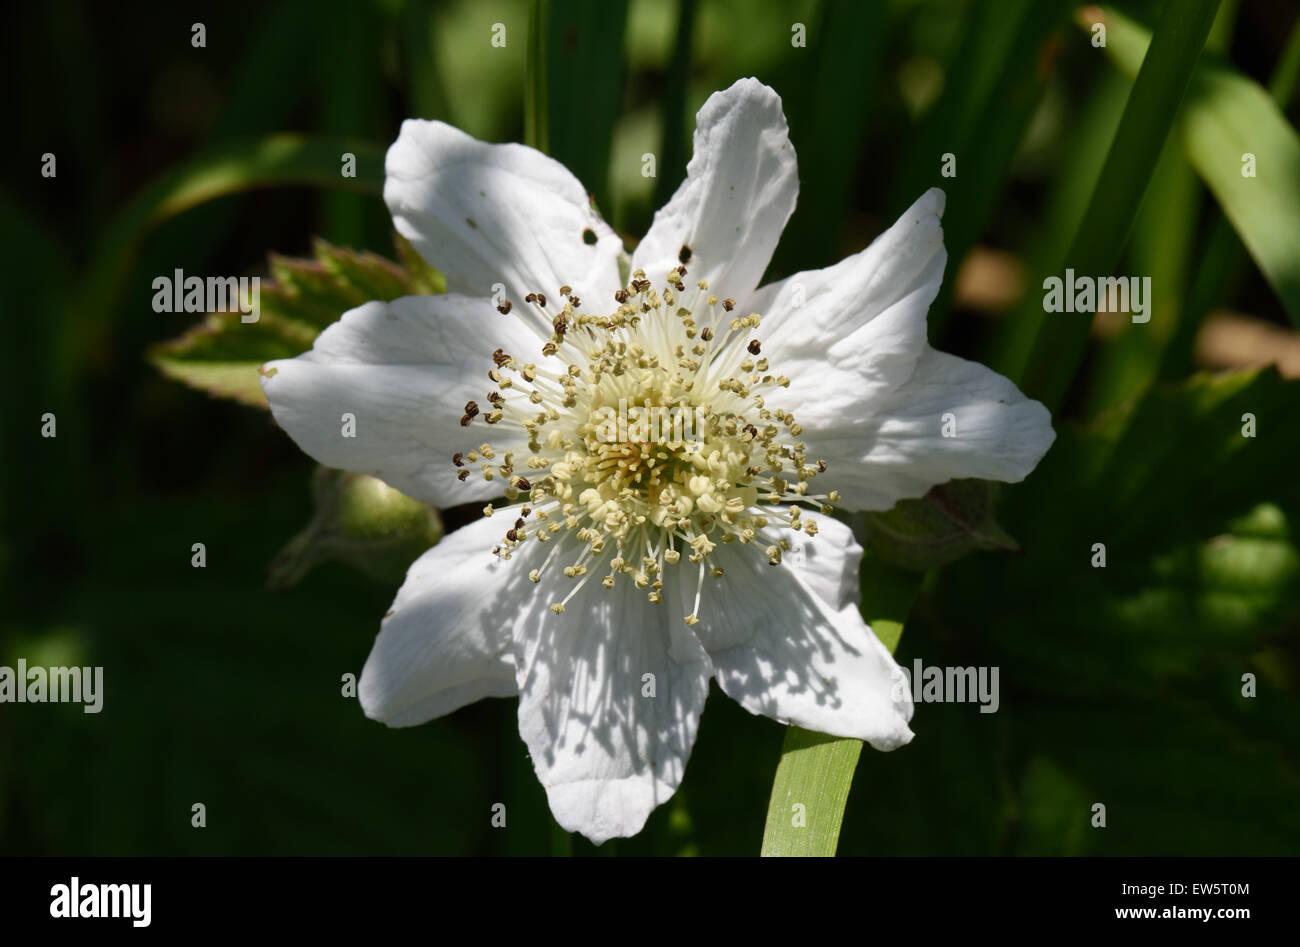 A bramble or blackberry, Rubus fruticosus, white Rosaceae flower, Berkshire, June - Stock Image